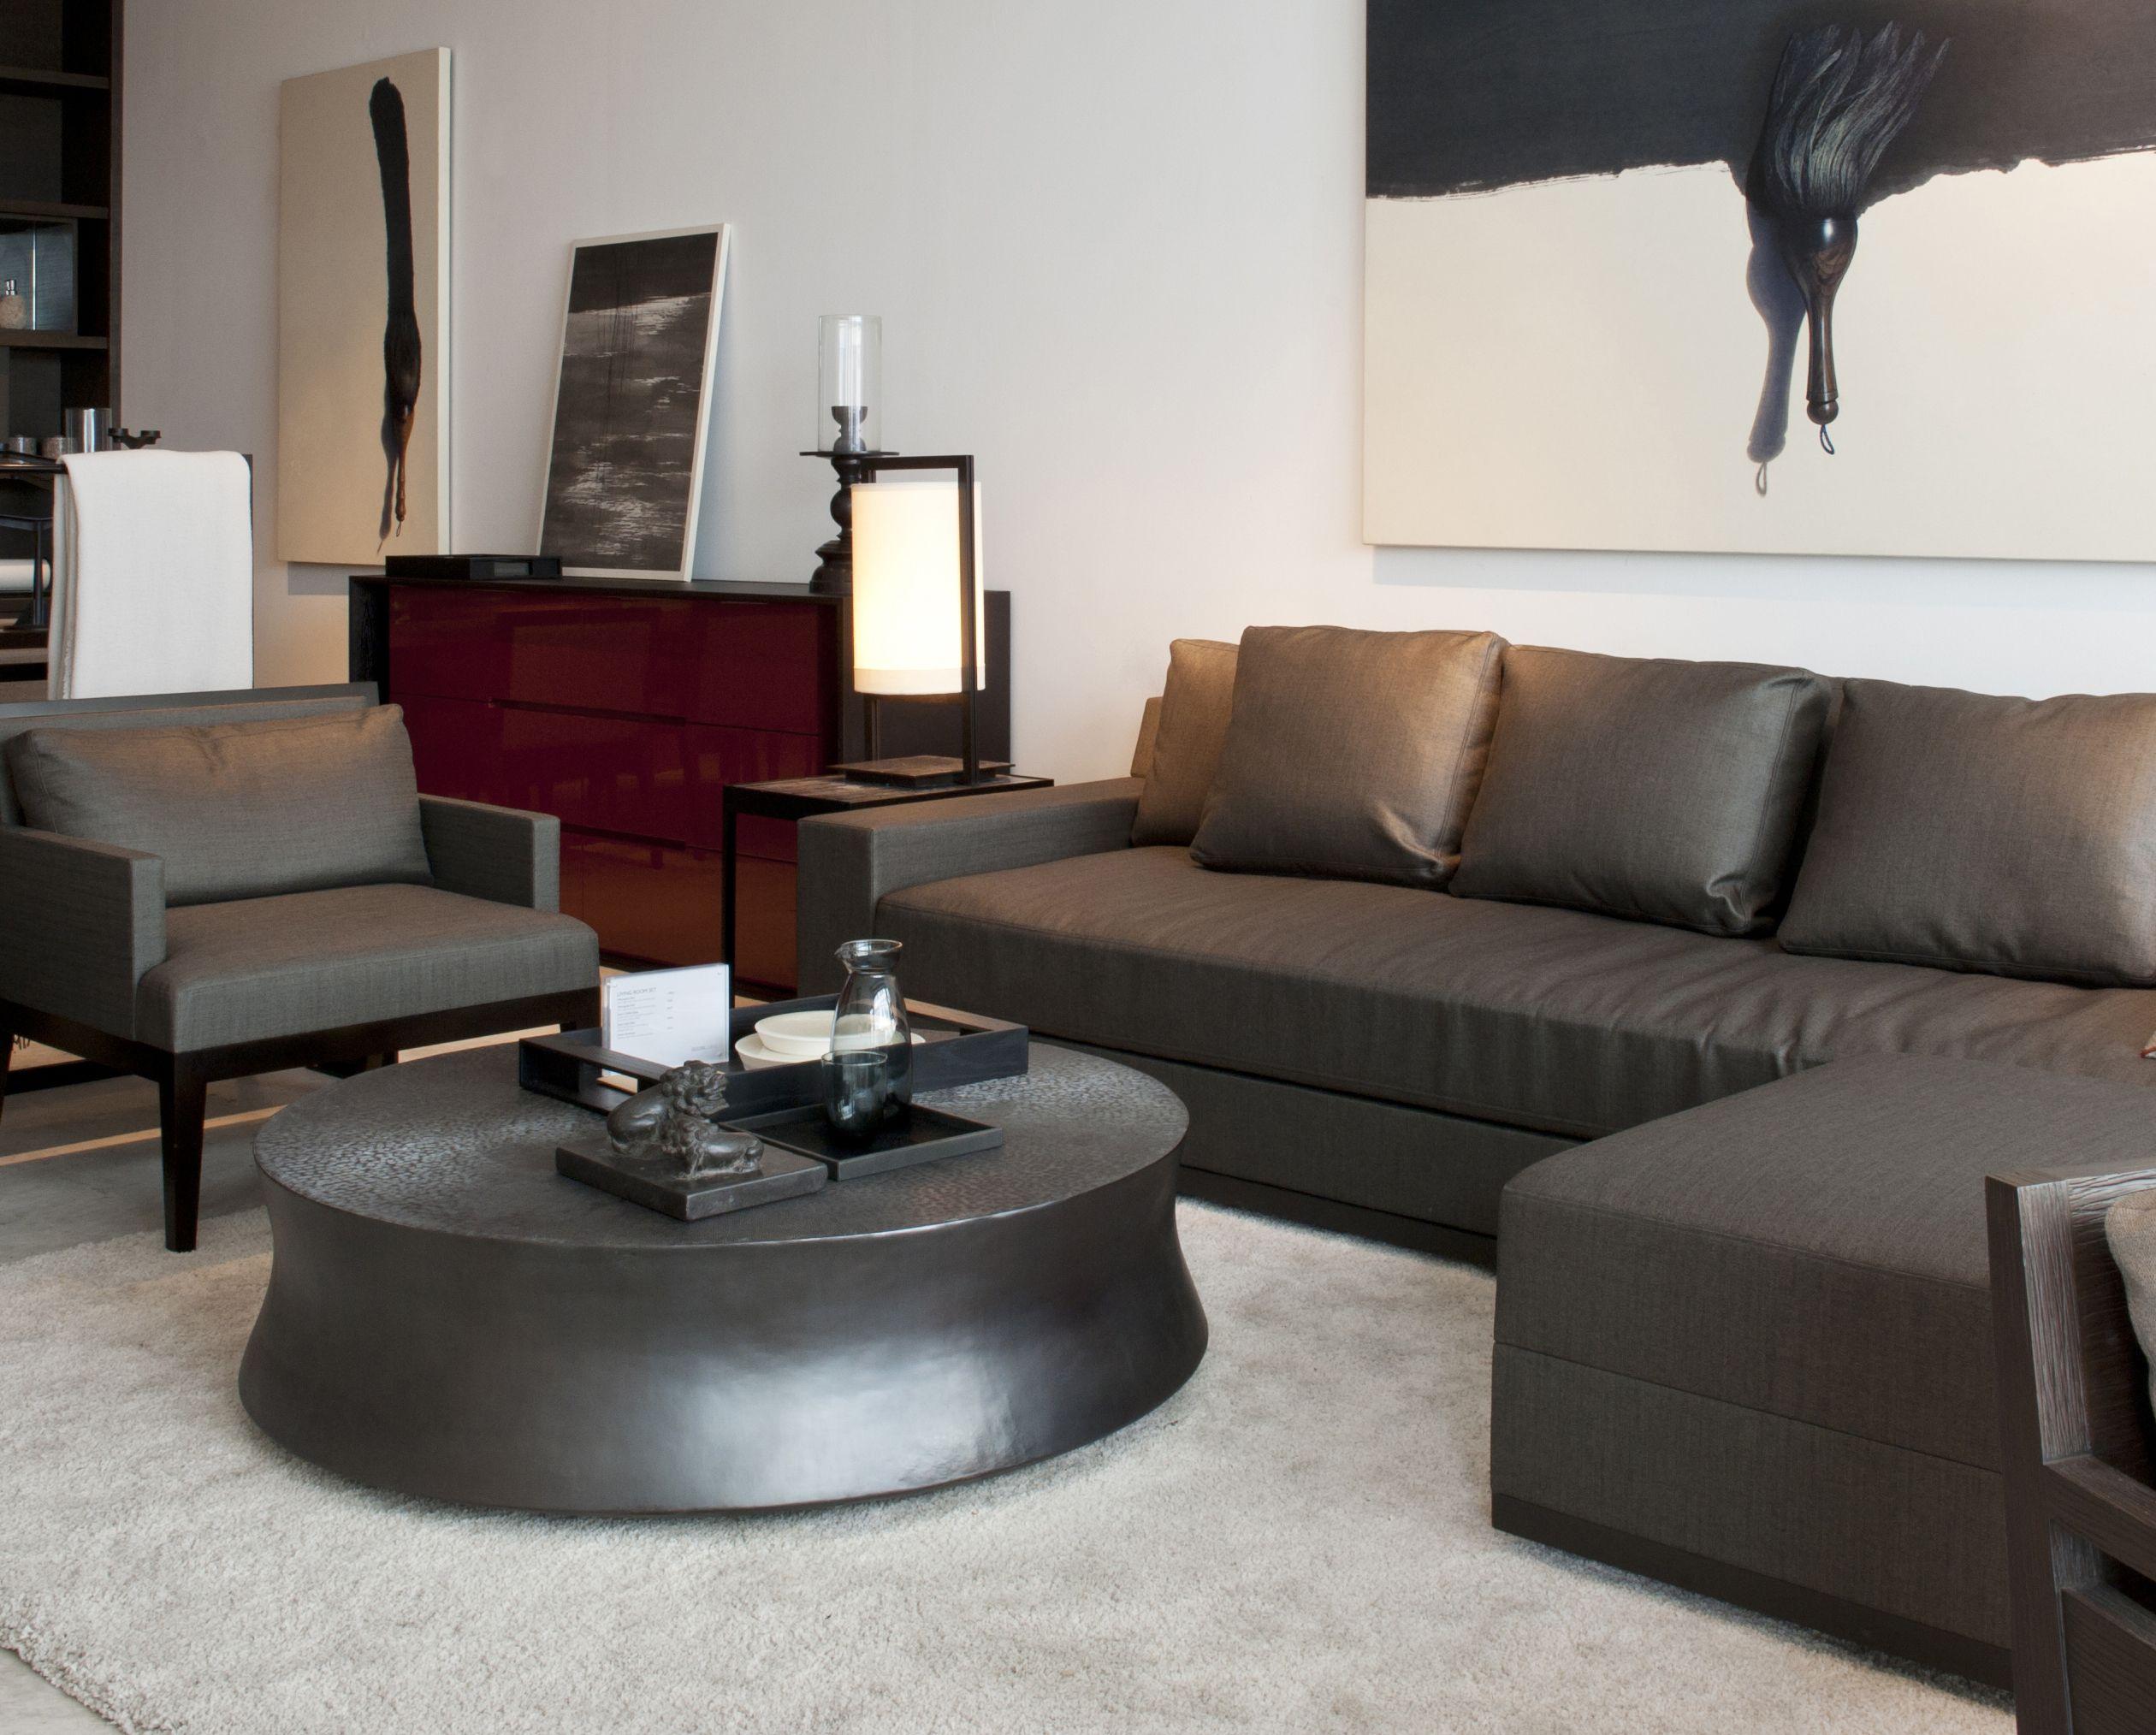 Scda Soori Living Showroom Singapore Living Showroom Home Coffee Tables Seating Groups [ 2028 x 2520 Pixel ]